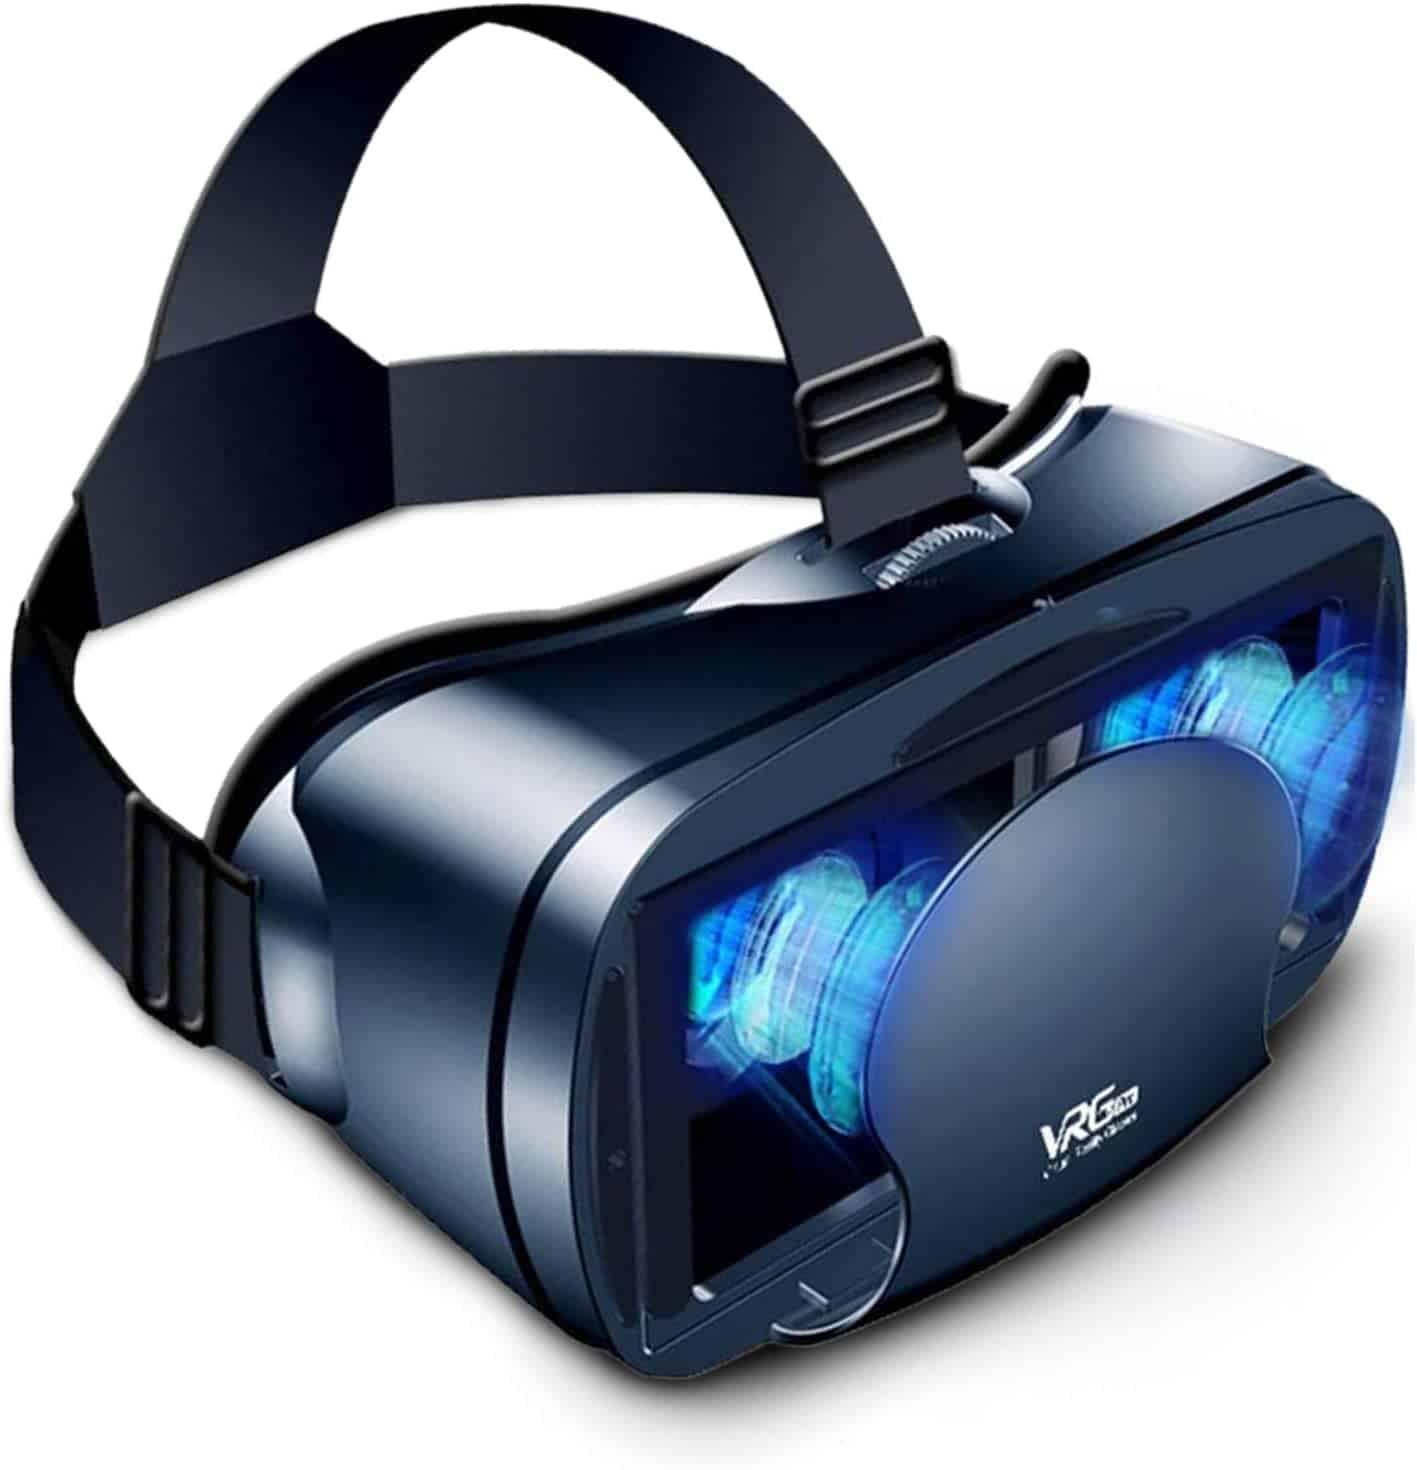 YUSHENG 3D Virtual Reality Glasses VR Headset